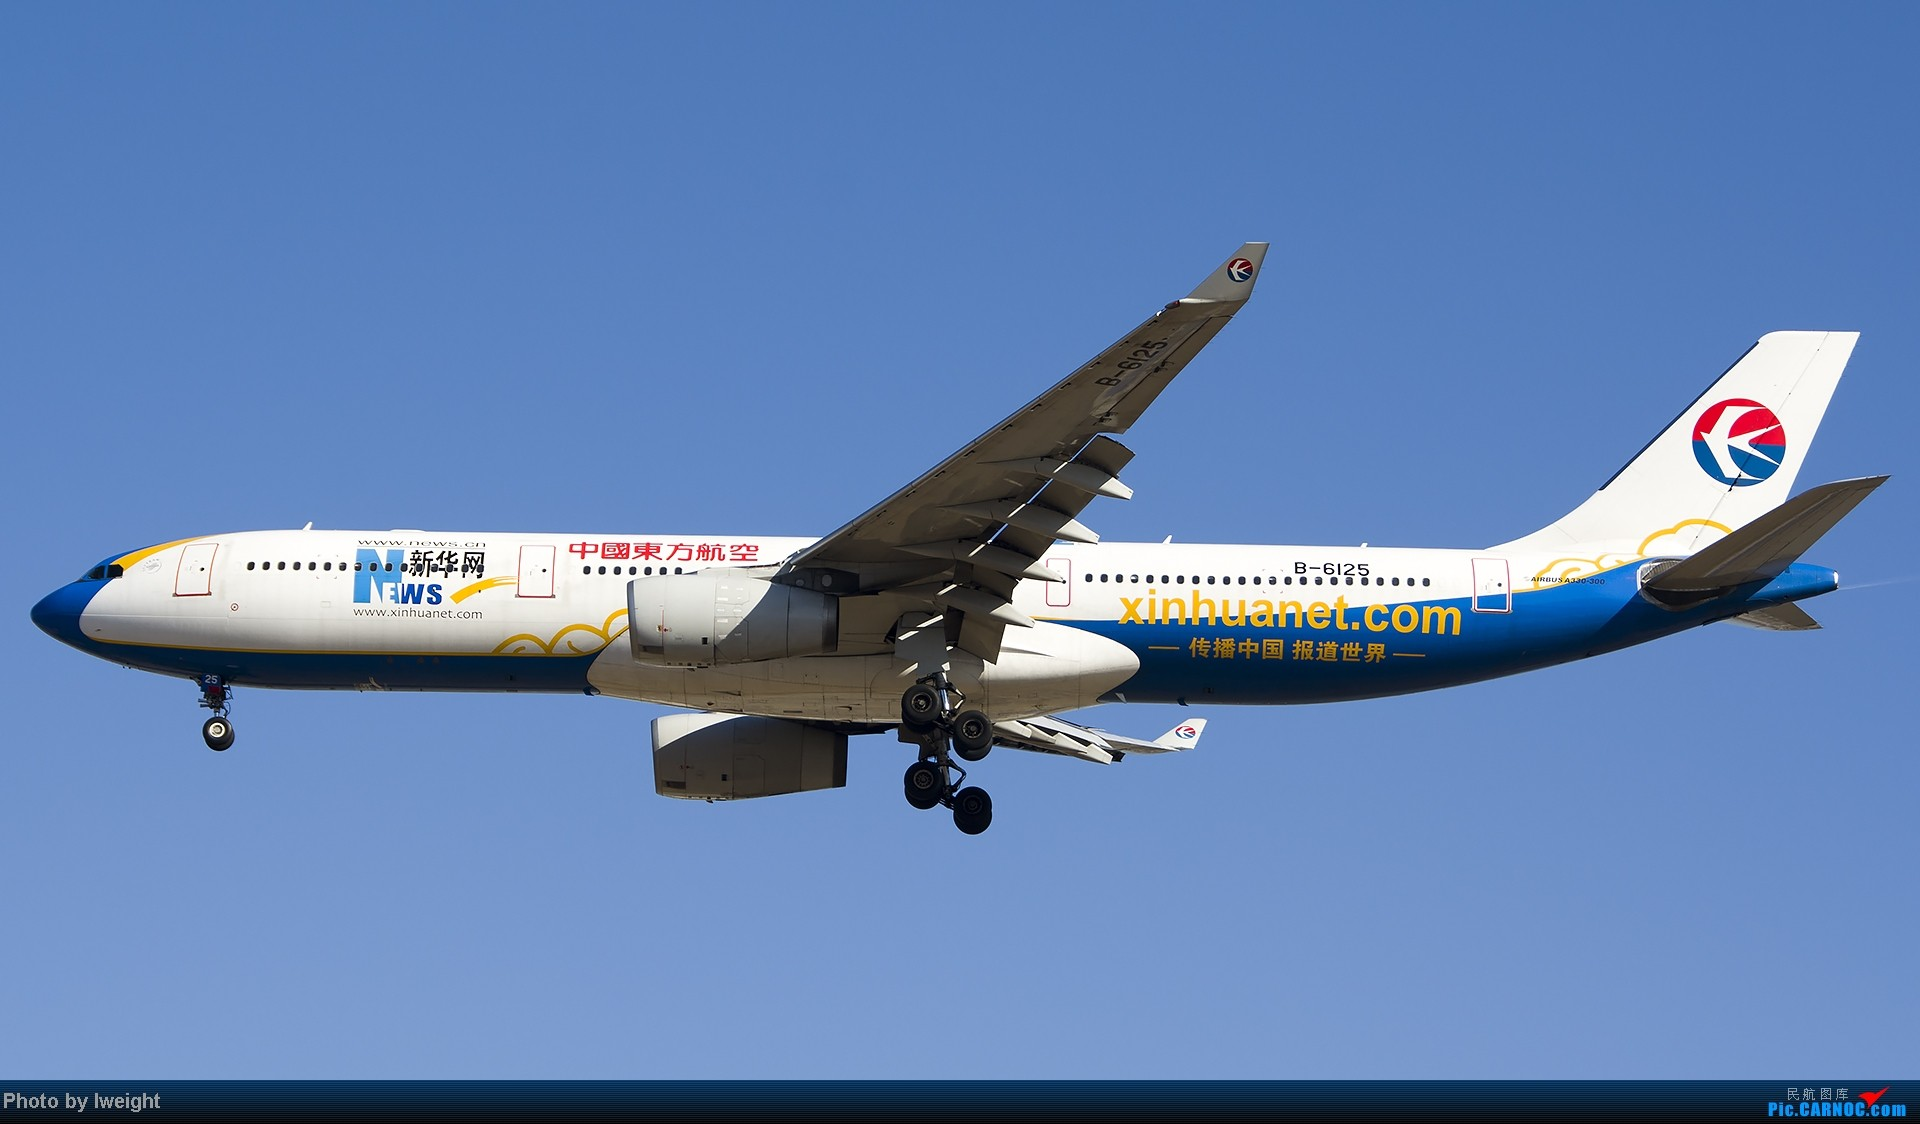 Re:[原创]抓住APEC蓝的尾巴,再拍上一组 AIRBUS A330-300 B-6125 中国北京首都机场